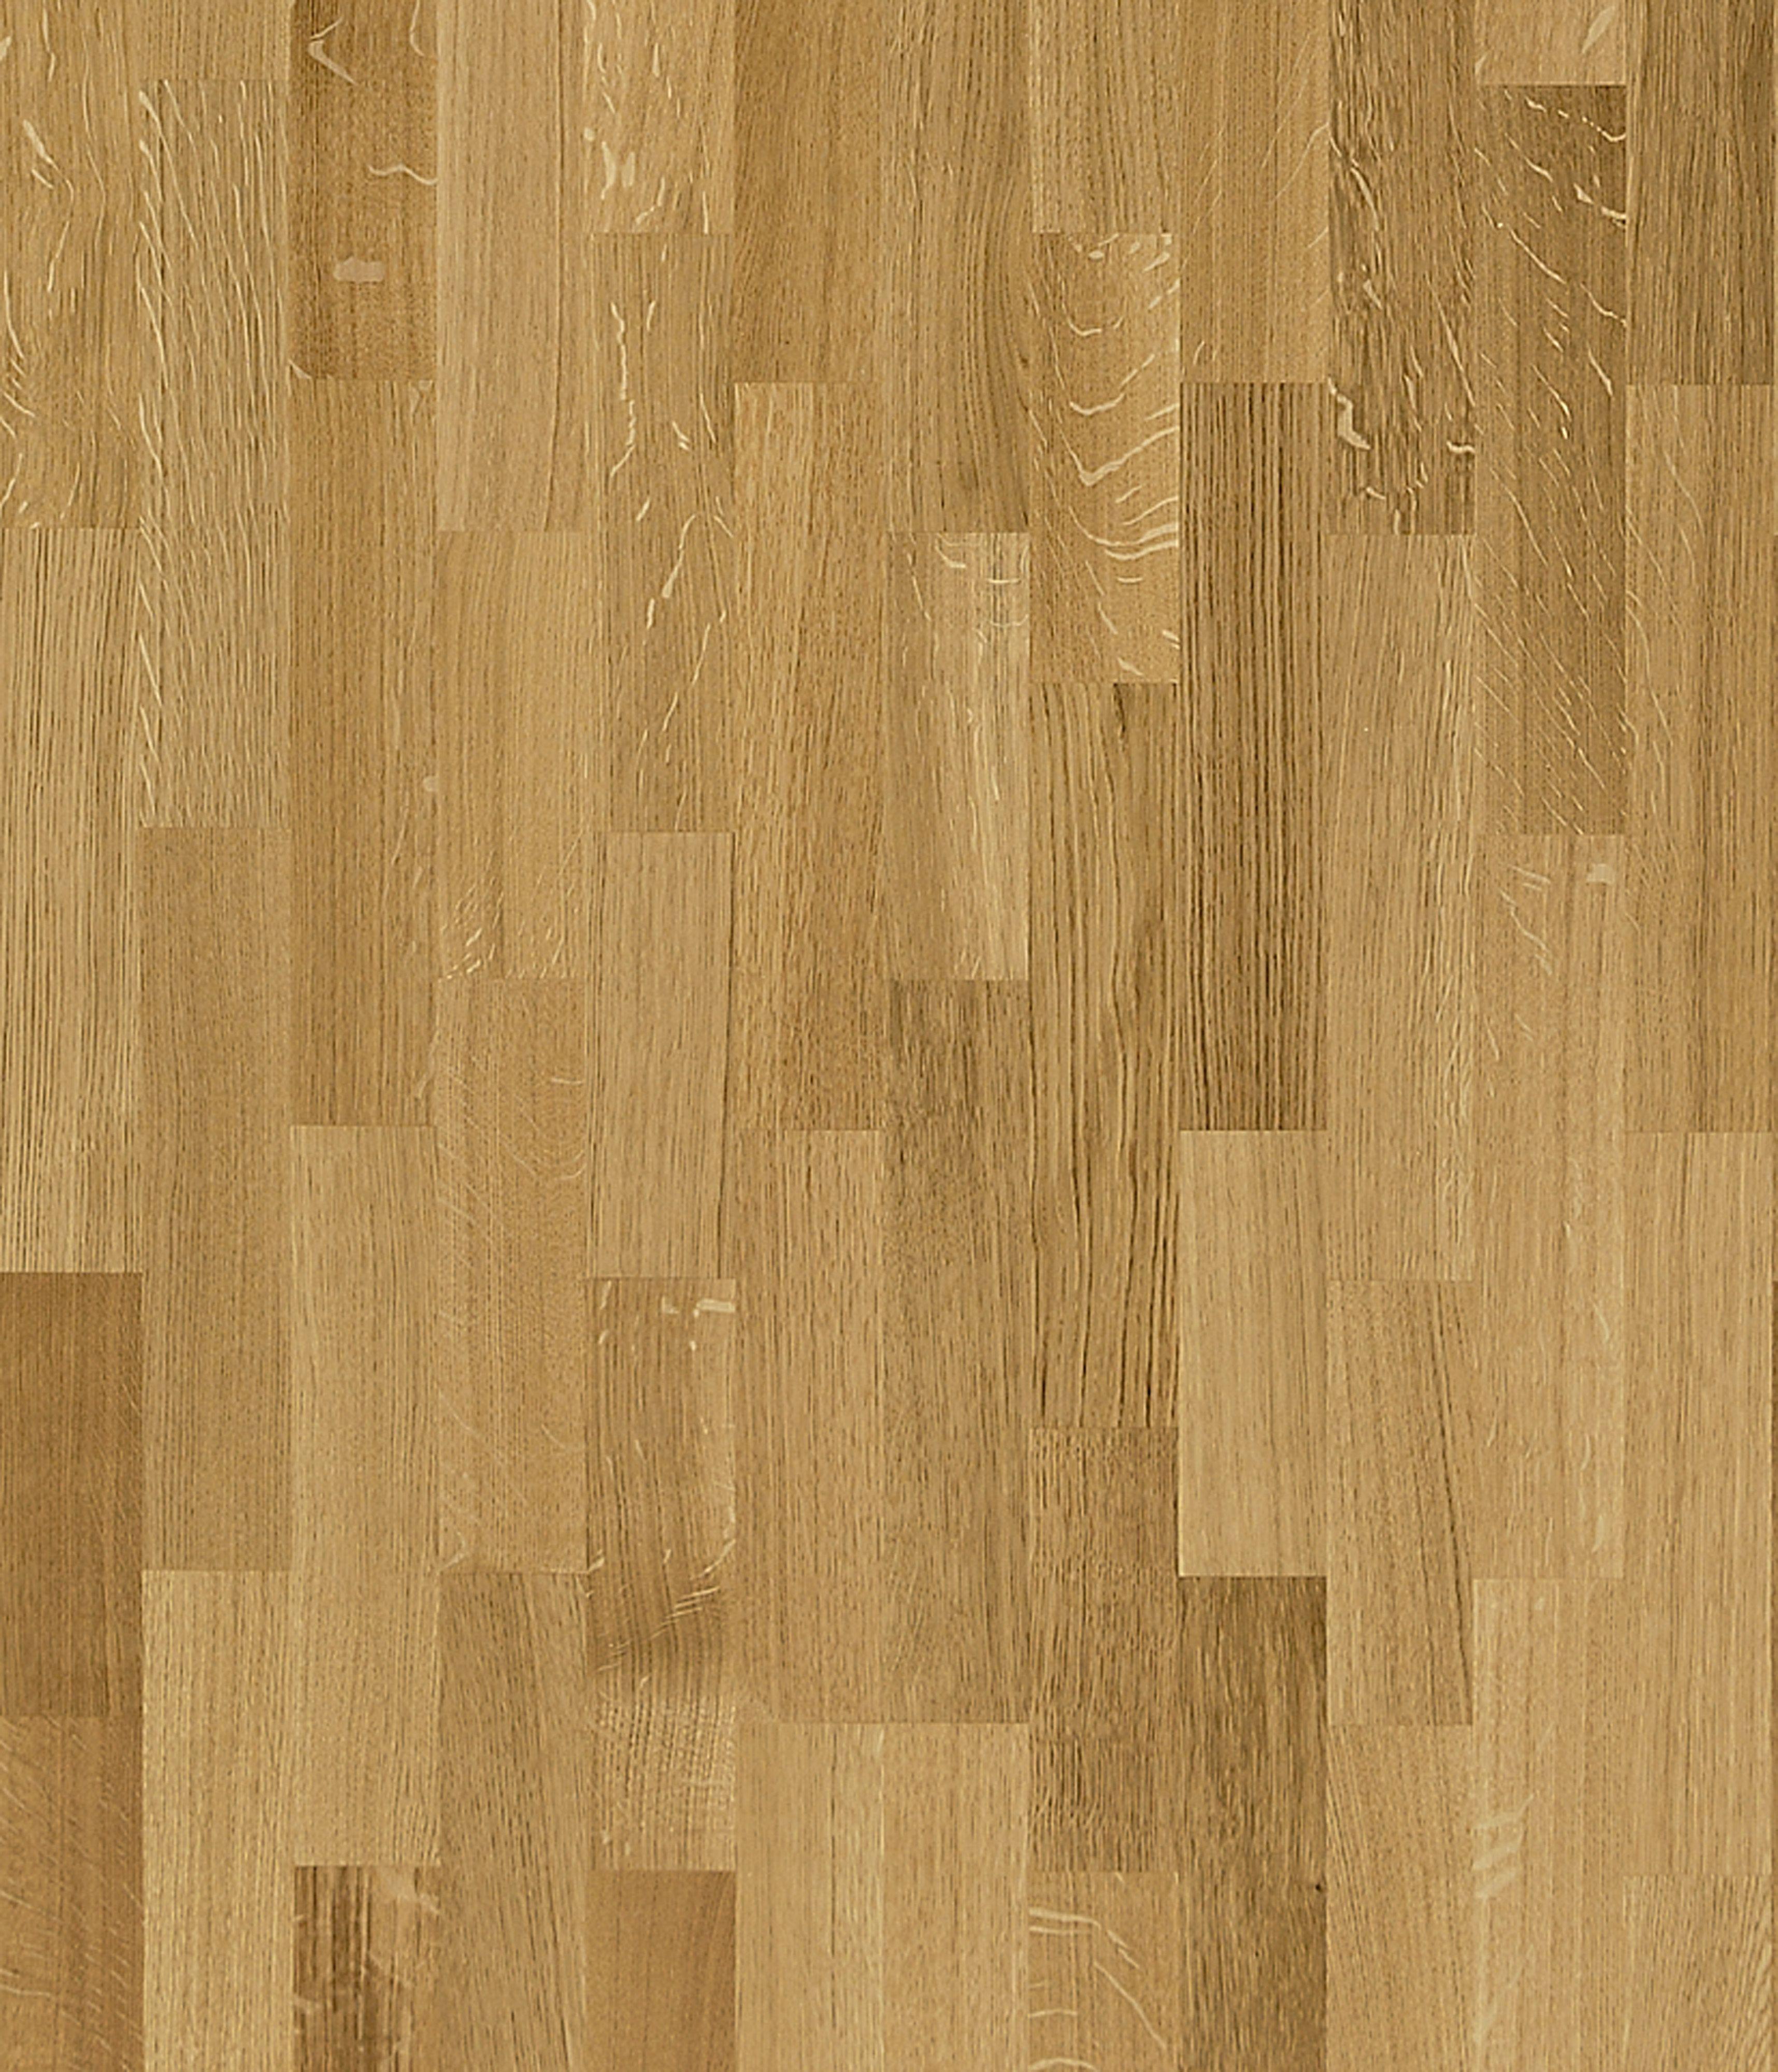 Kahrs Wood Flooring Parquet Interior Design Www Kahrs Com